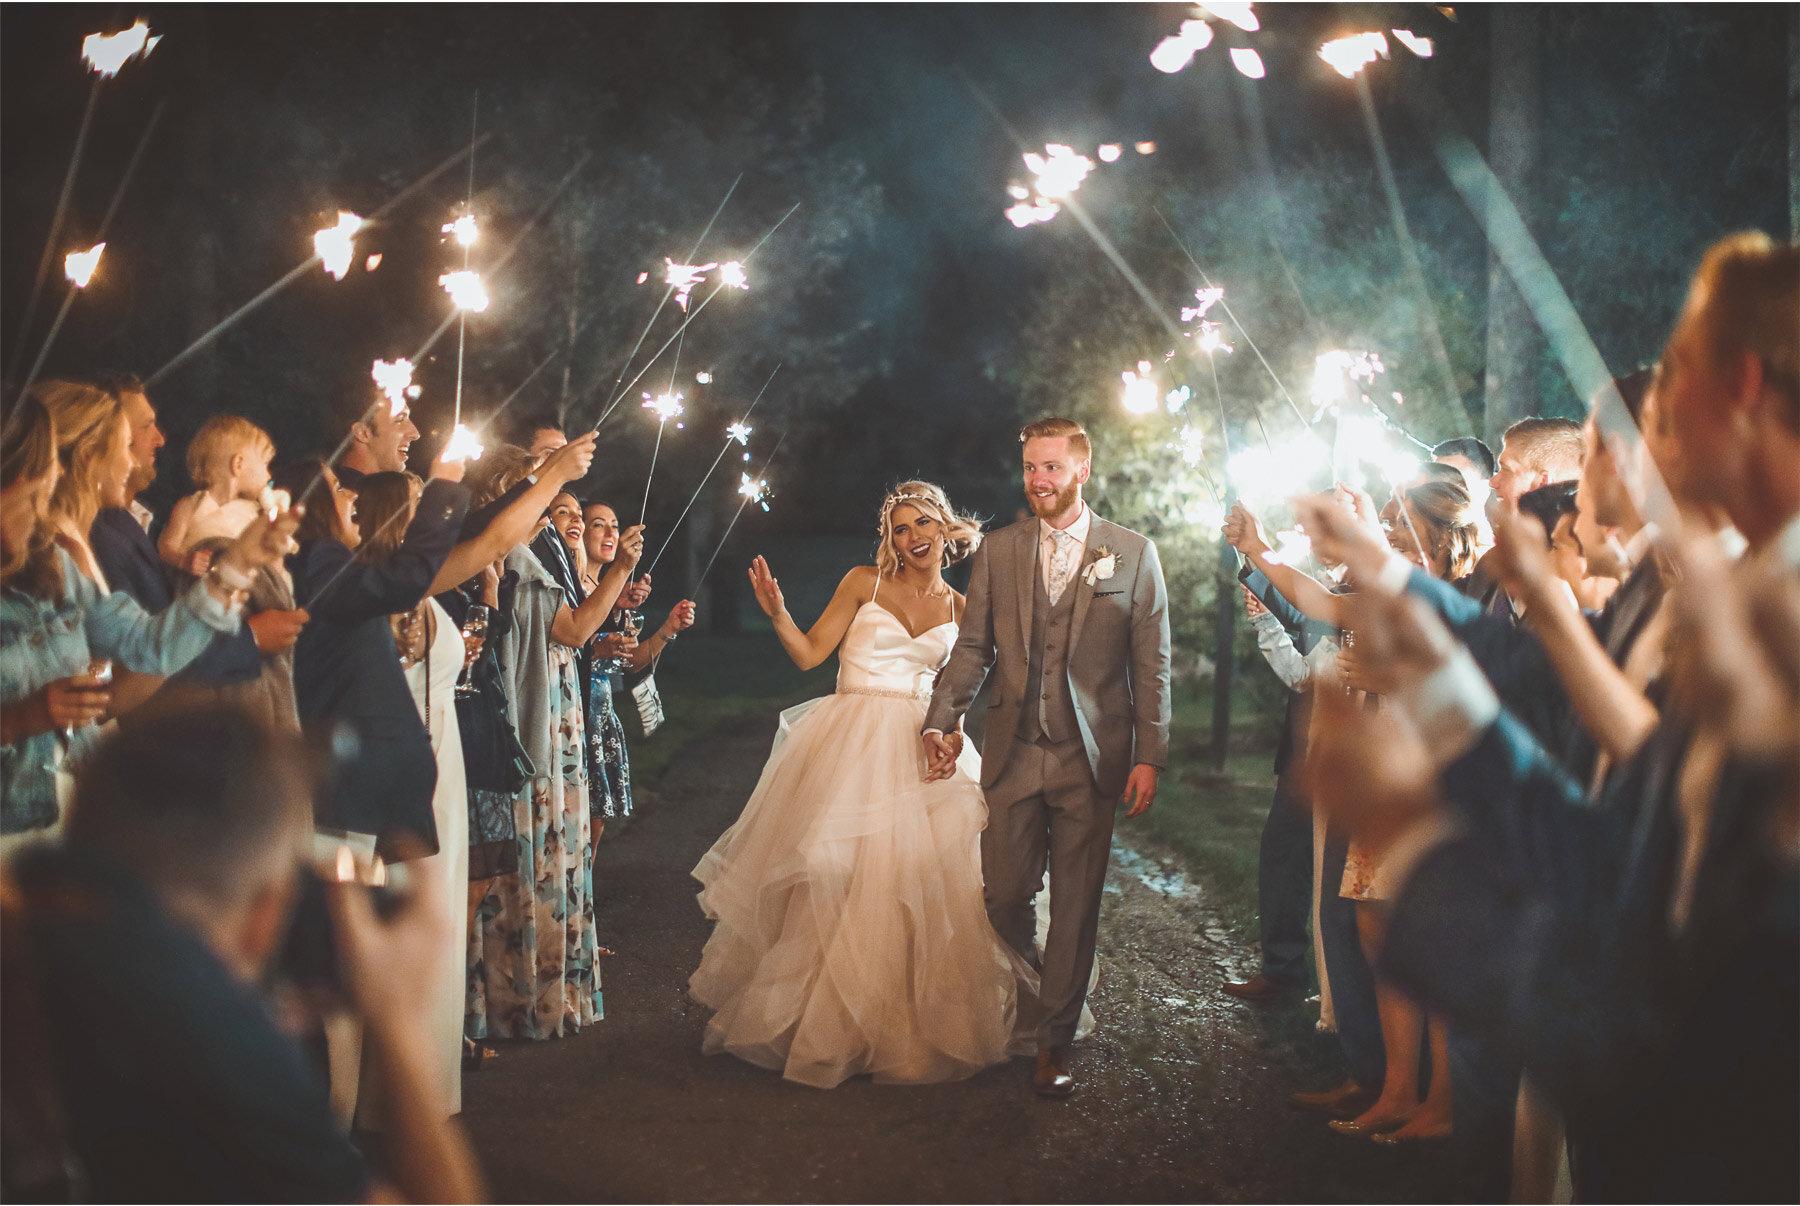 23-Vick-Photography-Wedding-Duluth-Minnesota-Glensheen-Mansion-Sparkler-Send-Off-Catherine-and-John.jpg.jpg